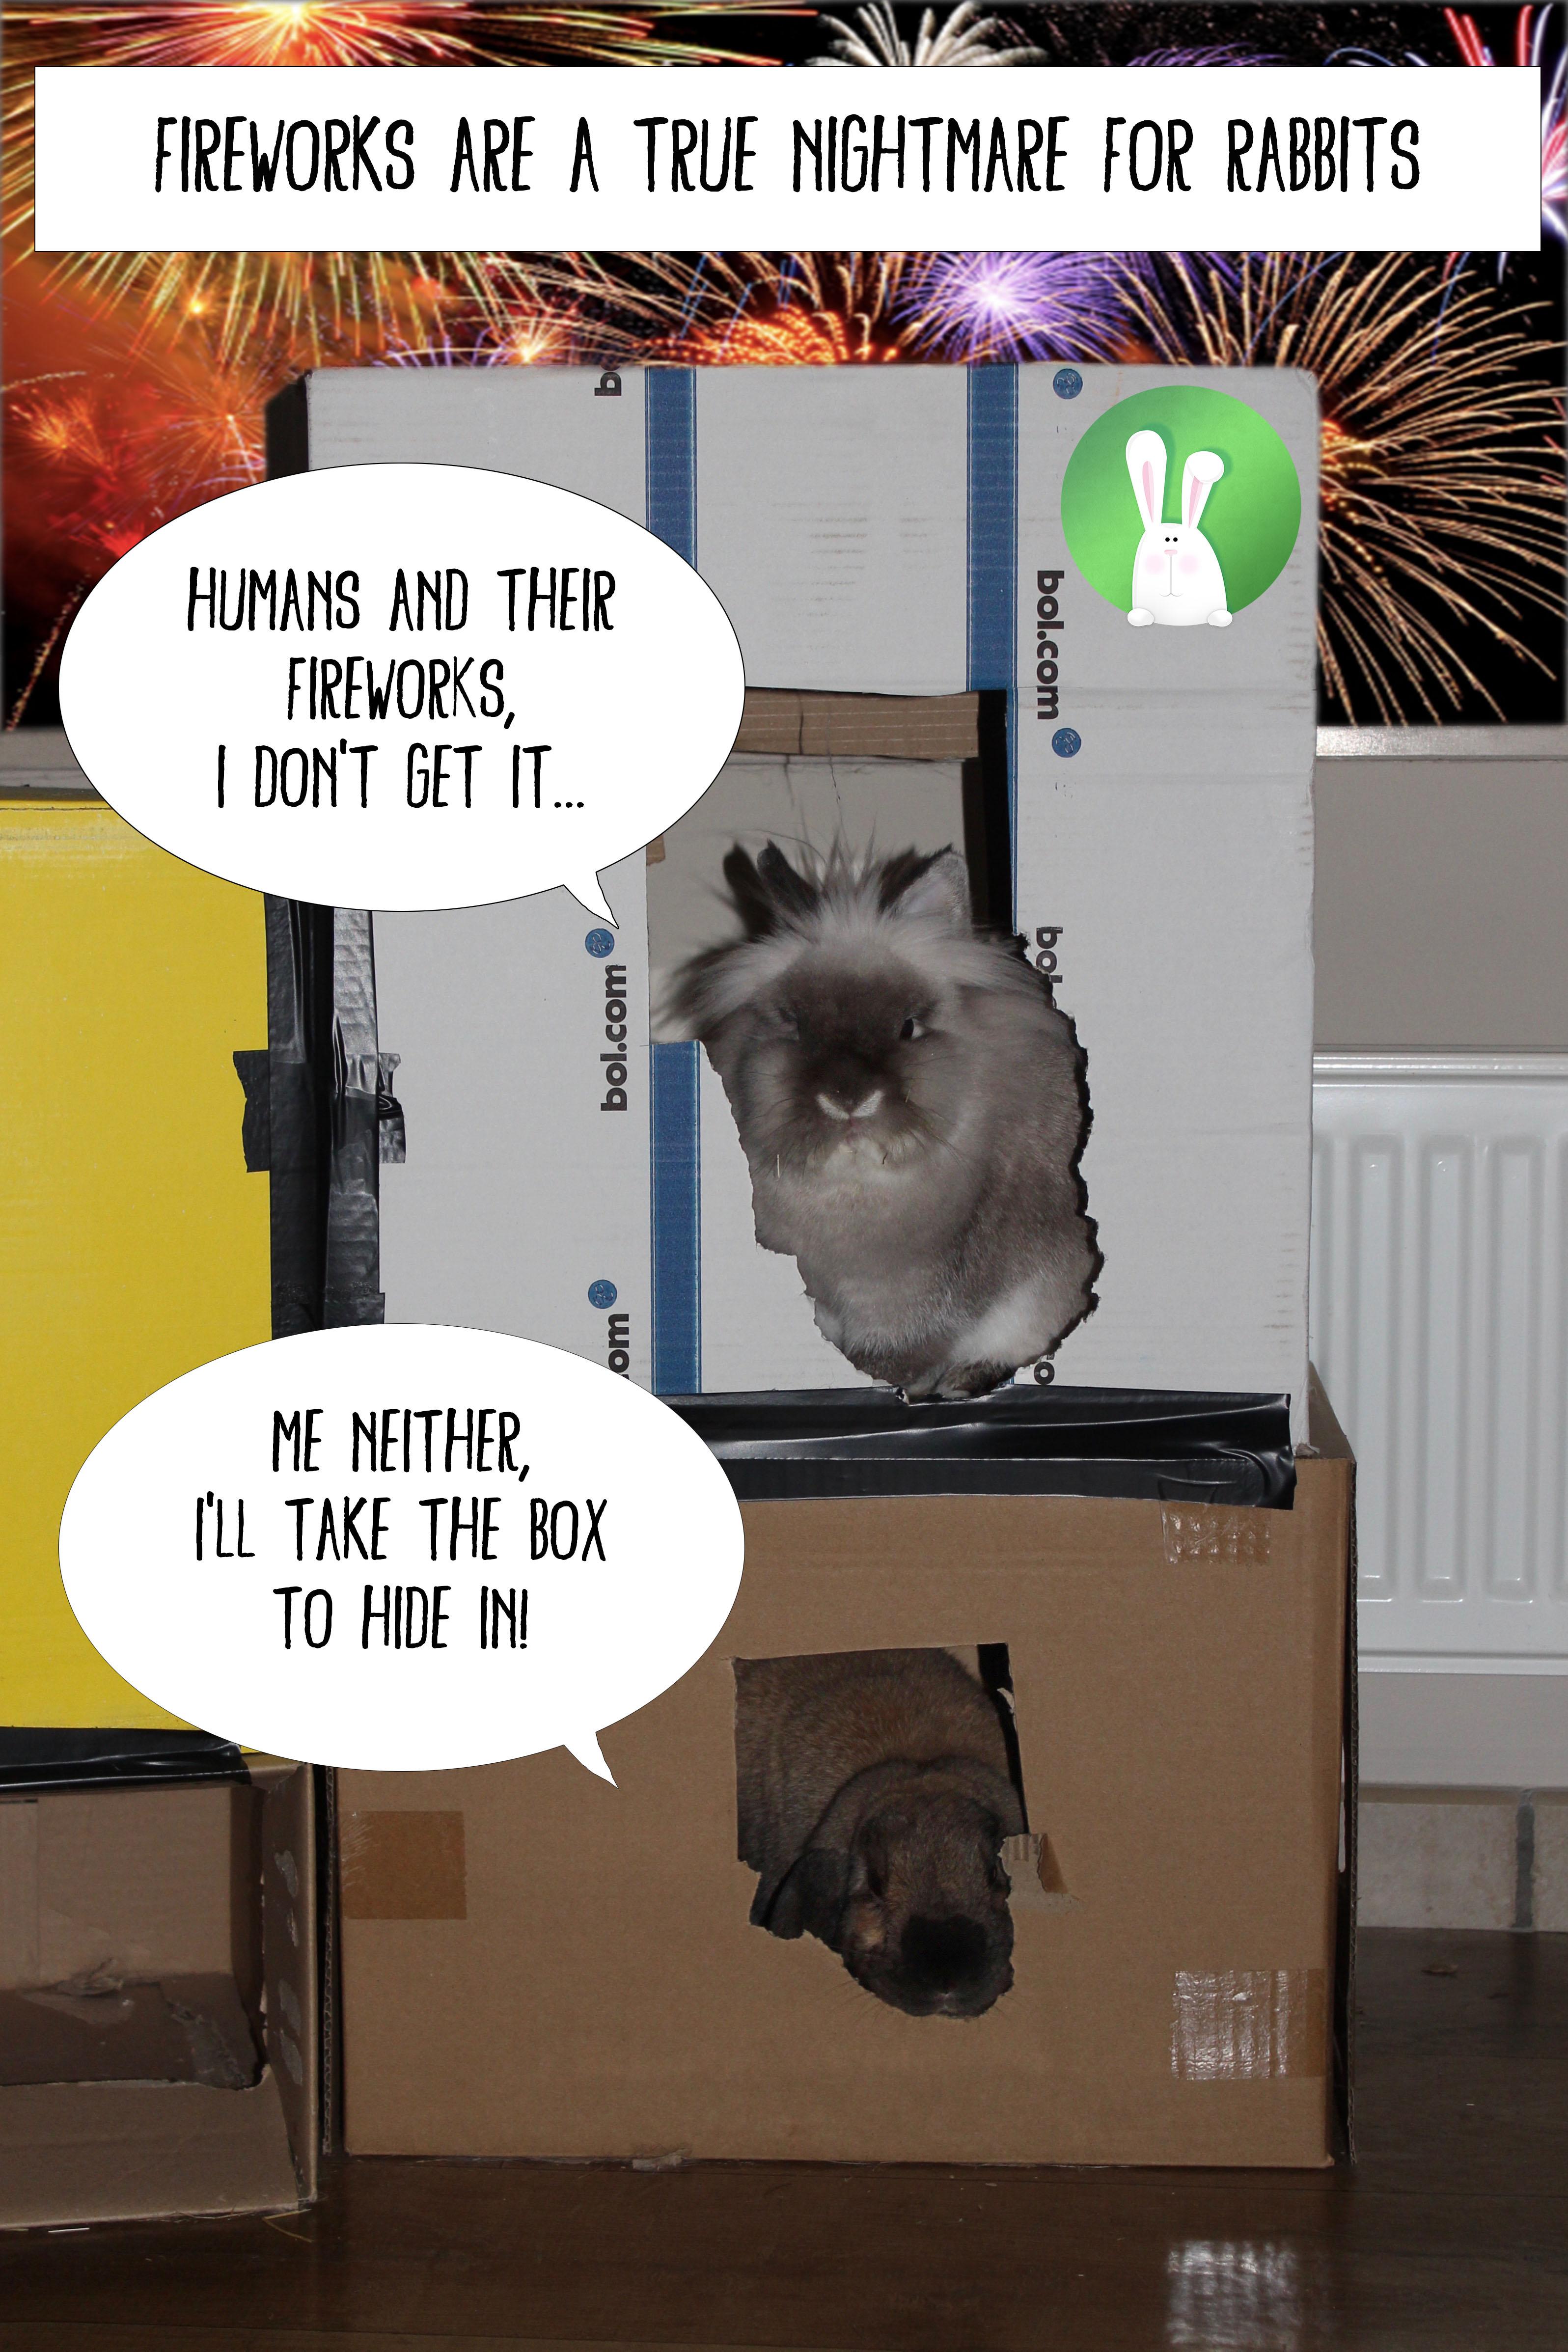 Rabbits and fireworks | Konijnenadviesbureau Hopster